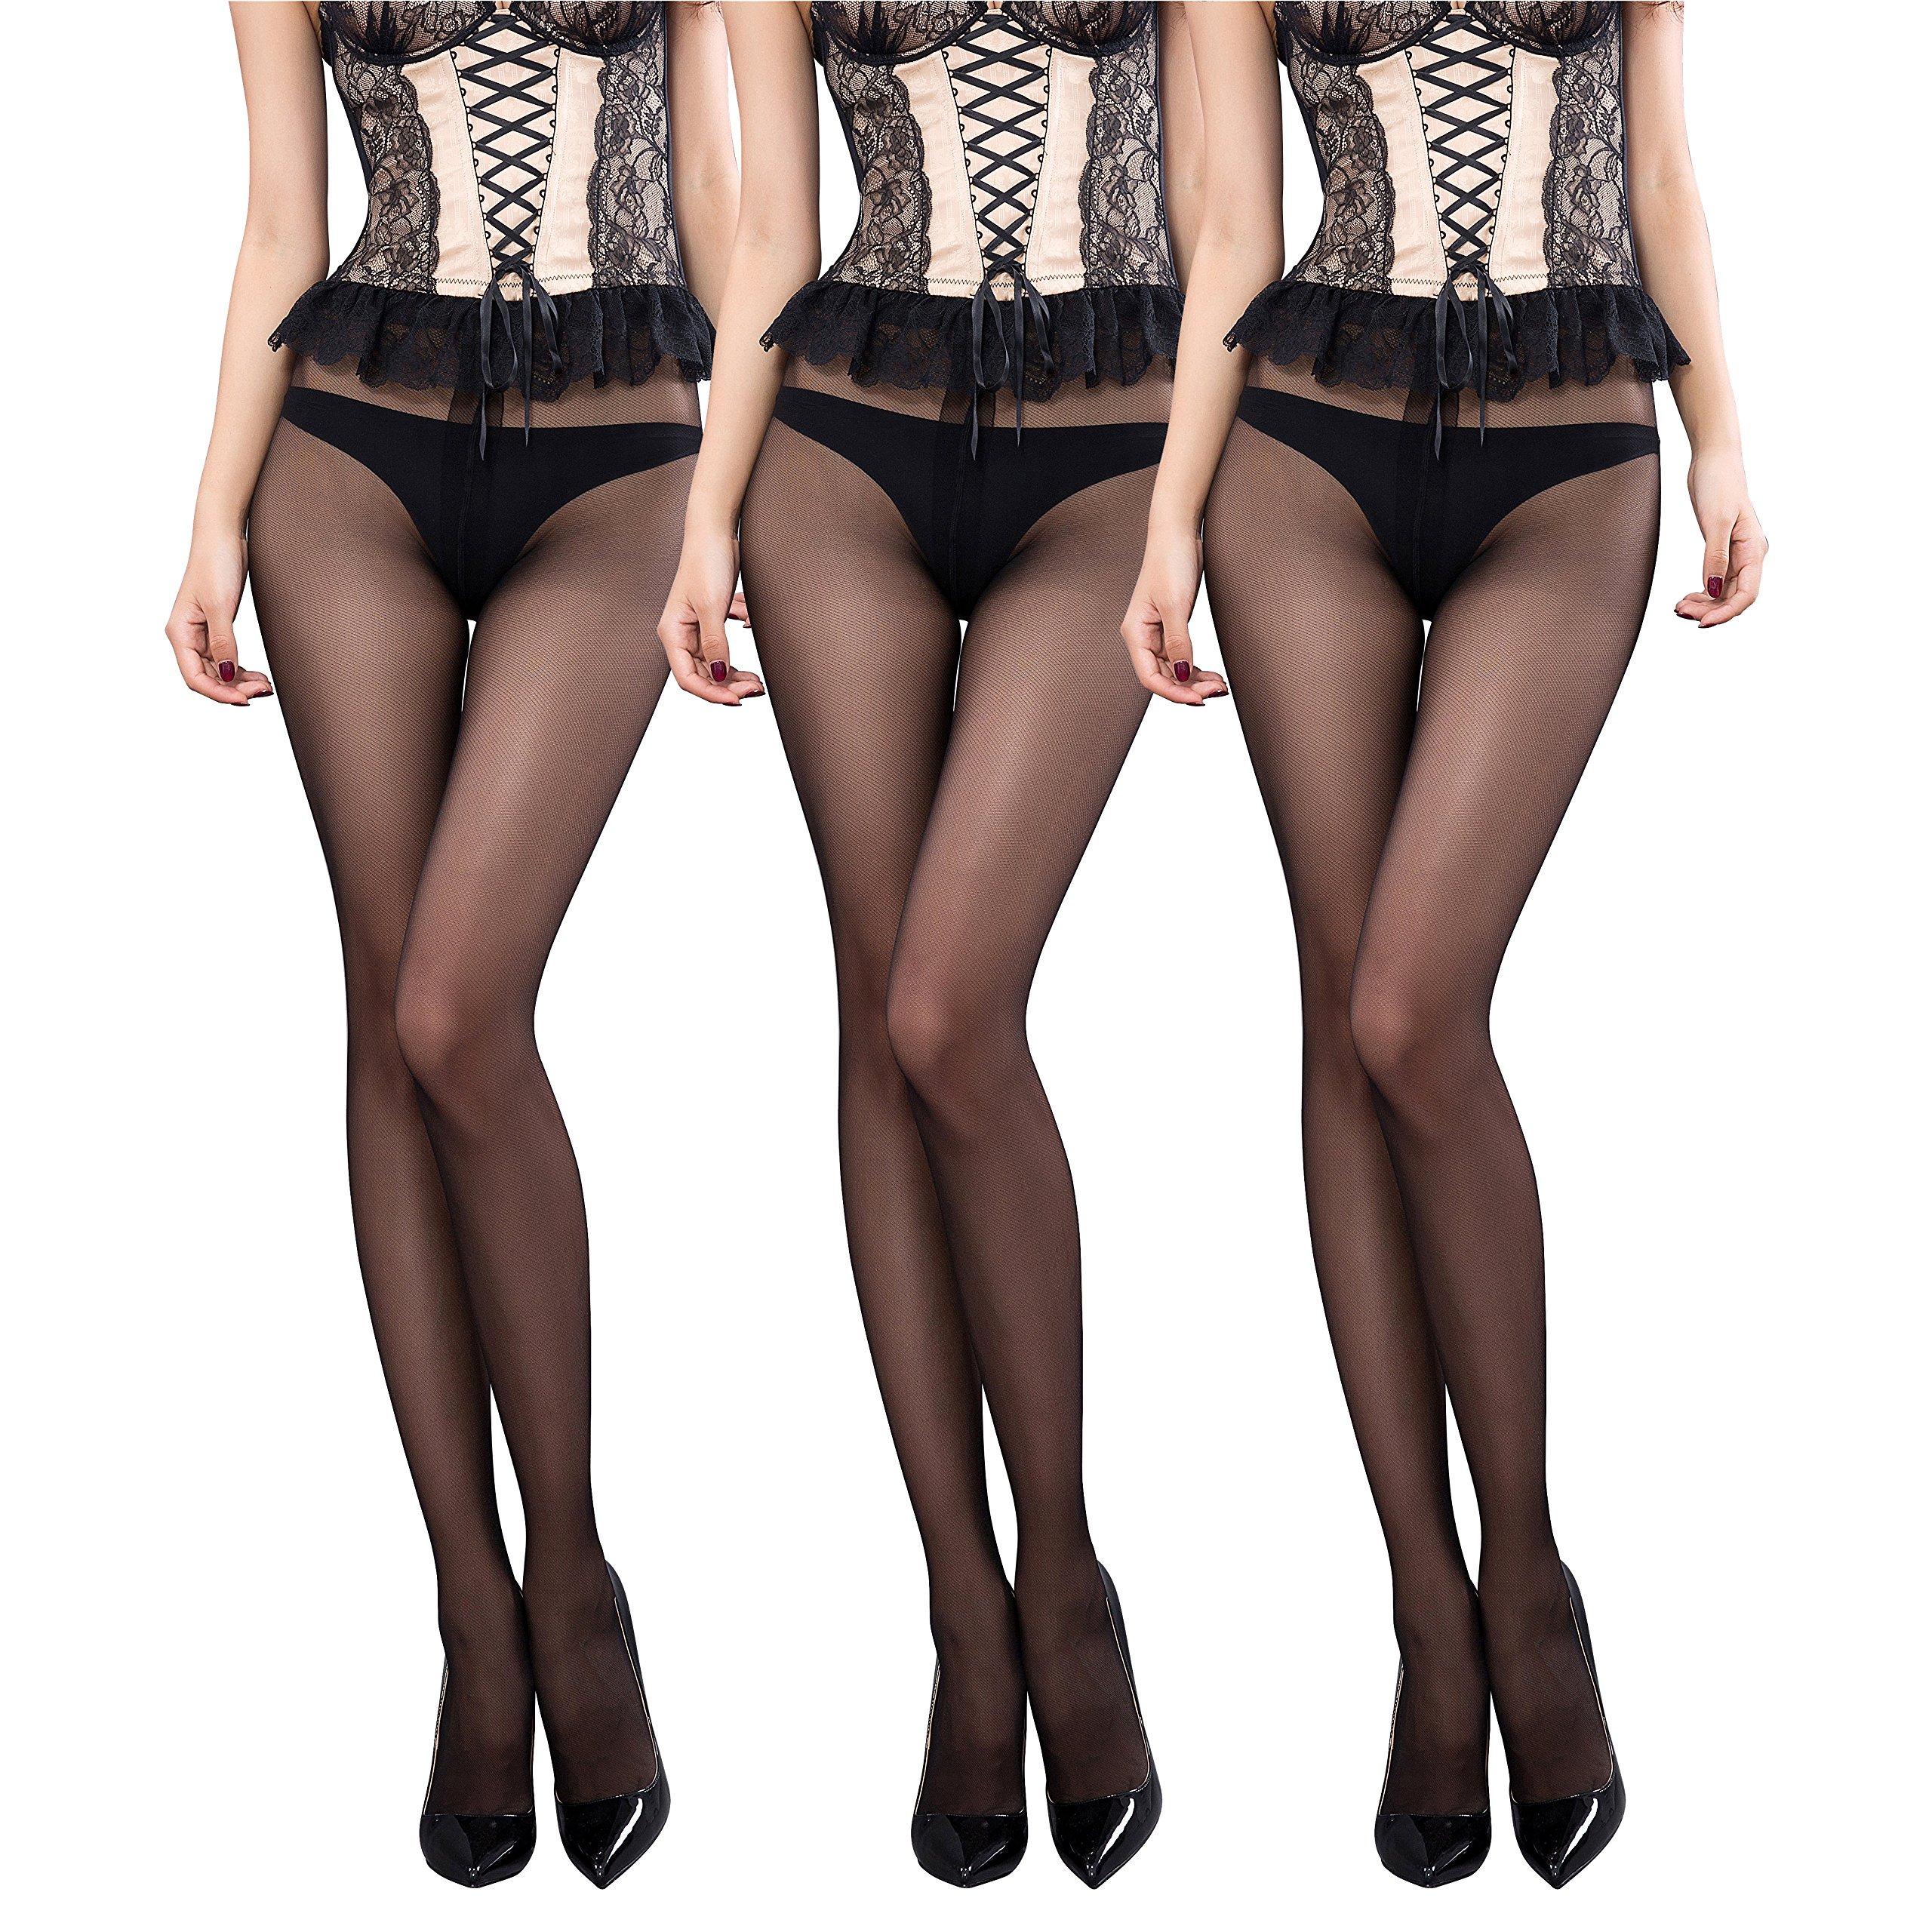 Pantyhose Stockings Length Reinforced Crotch